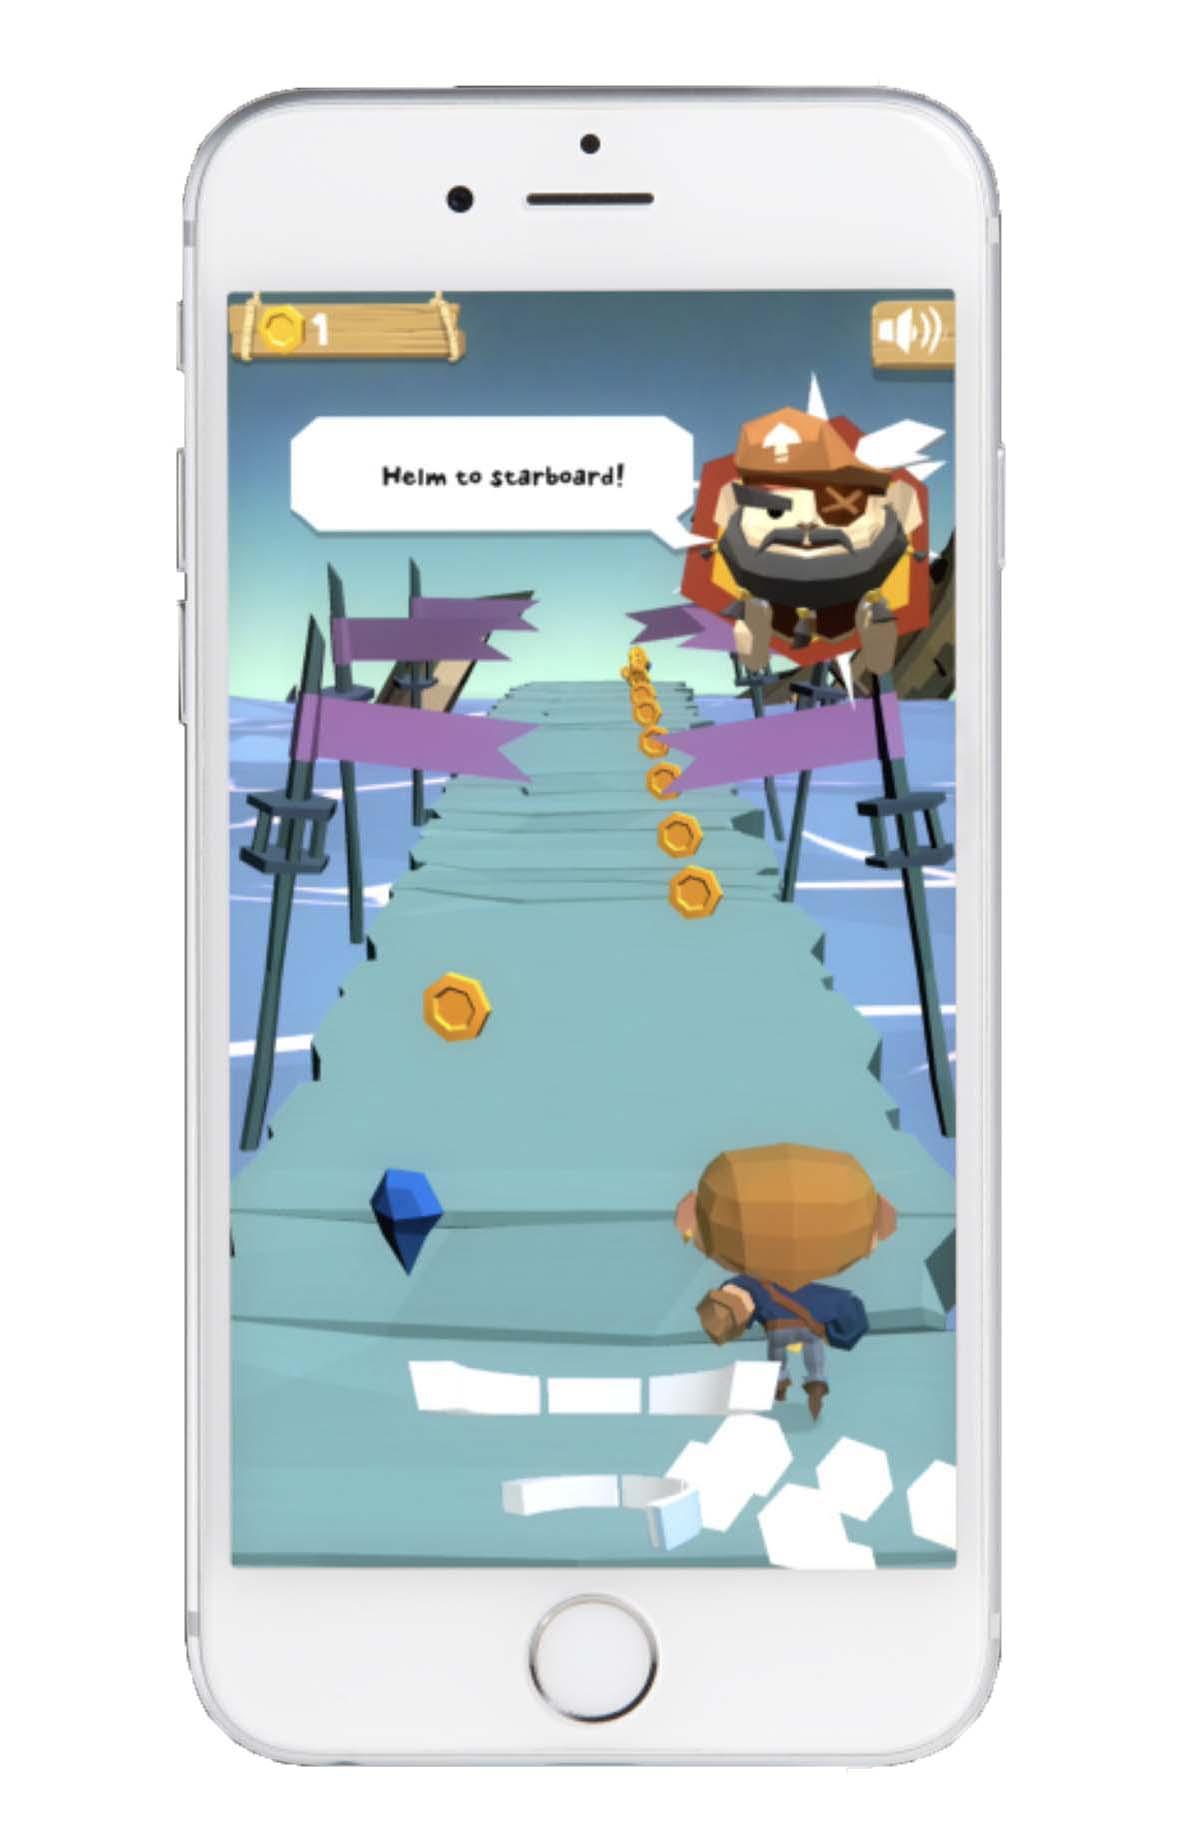 Colgate Connect App Pirate Game